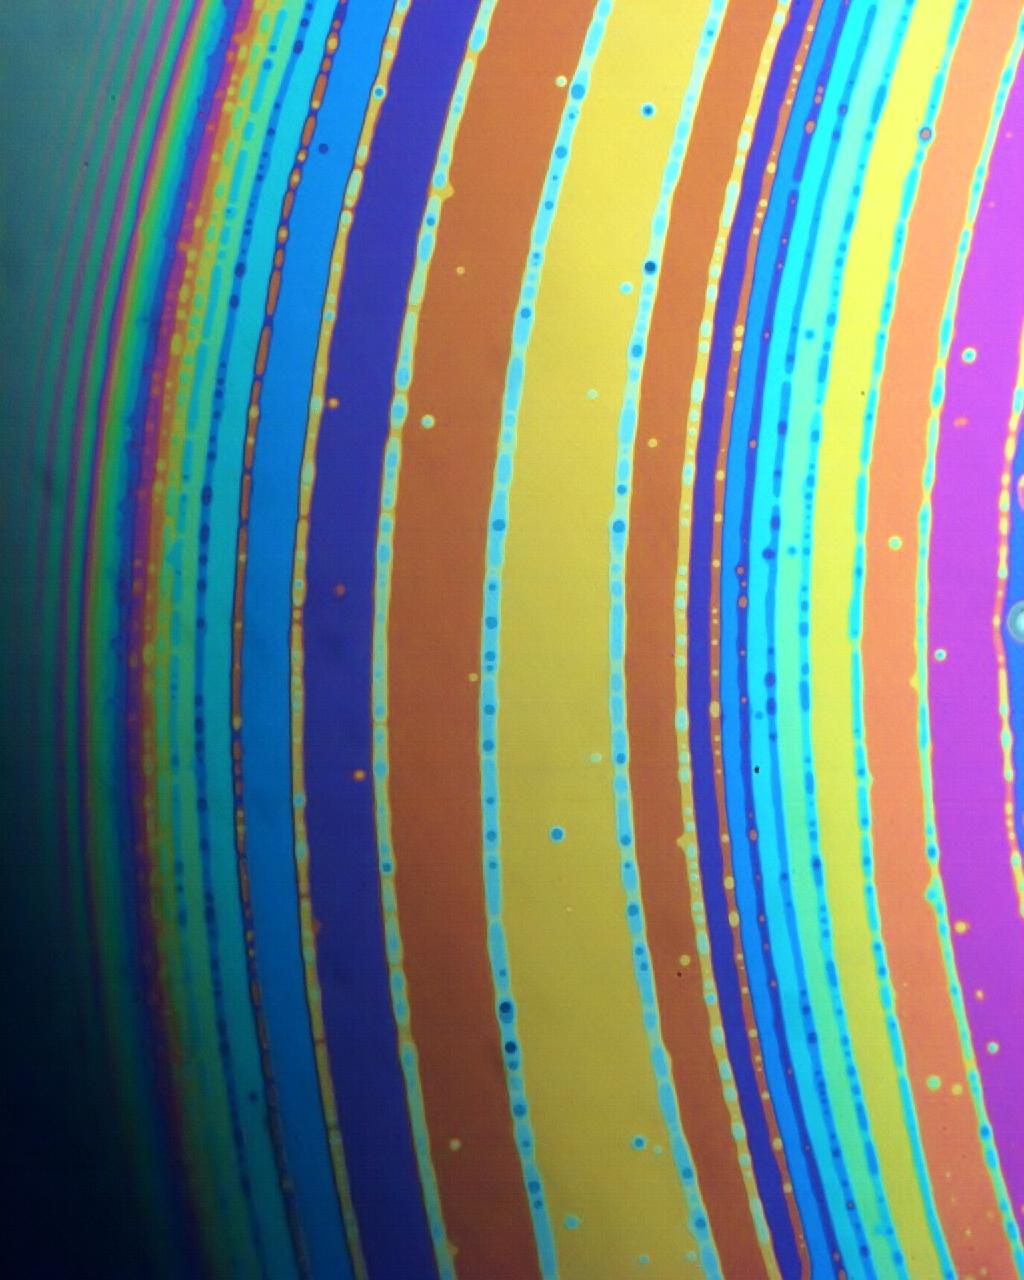 10xcolour_PSPMMA_200C_10007 (2).jpg